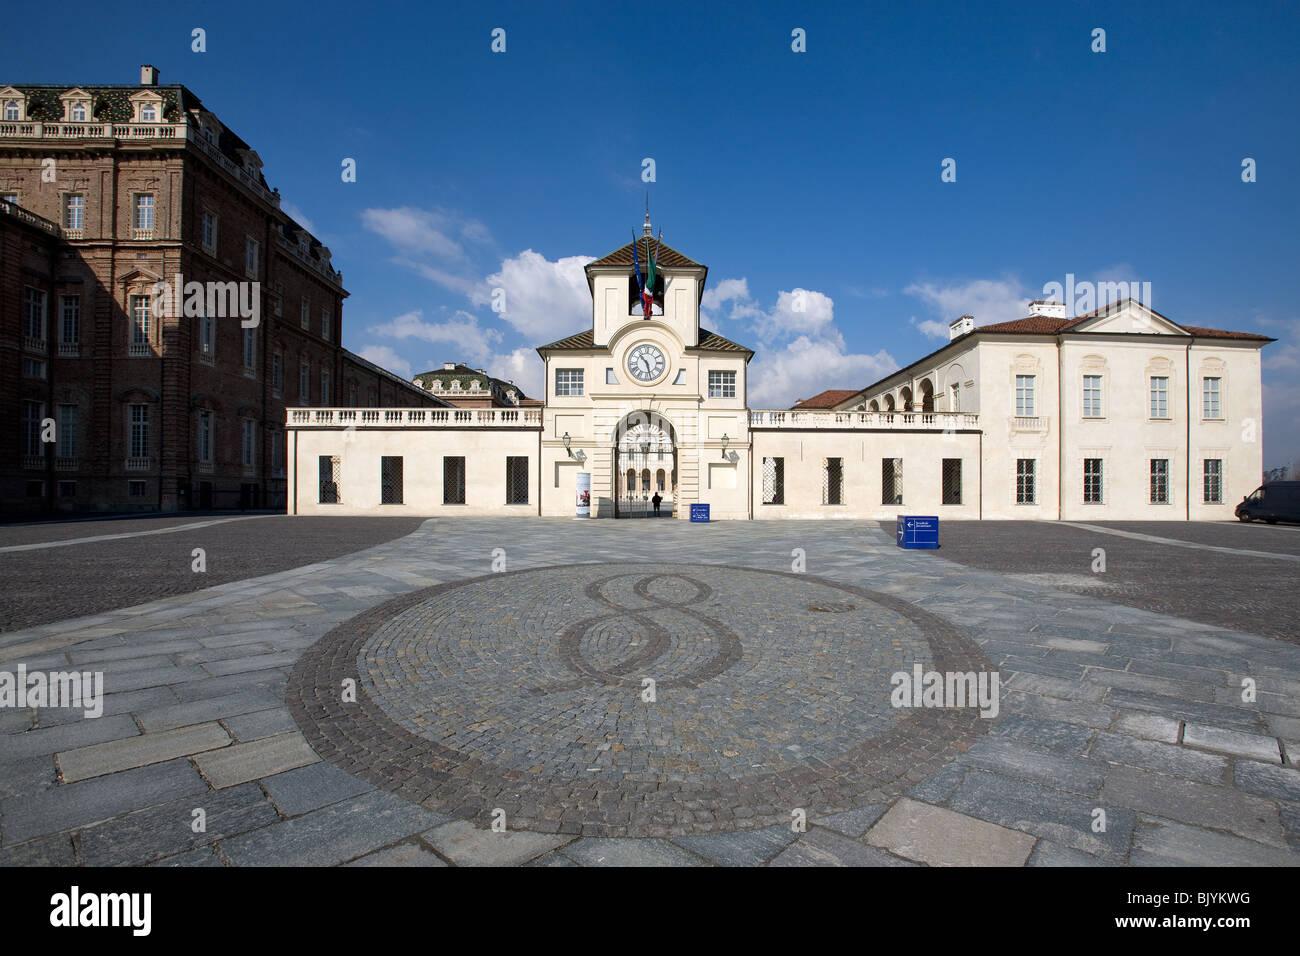 Italy, Turin, Torino, Reggia Venaria Reale, entrance - Stock Image